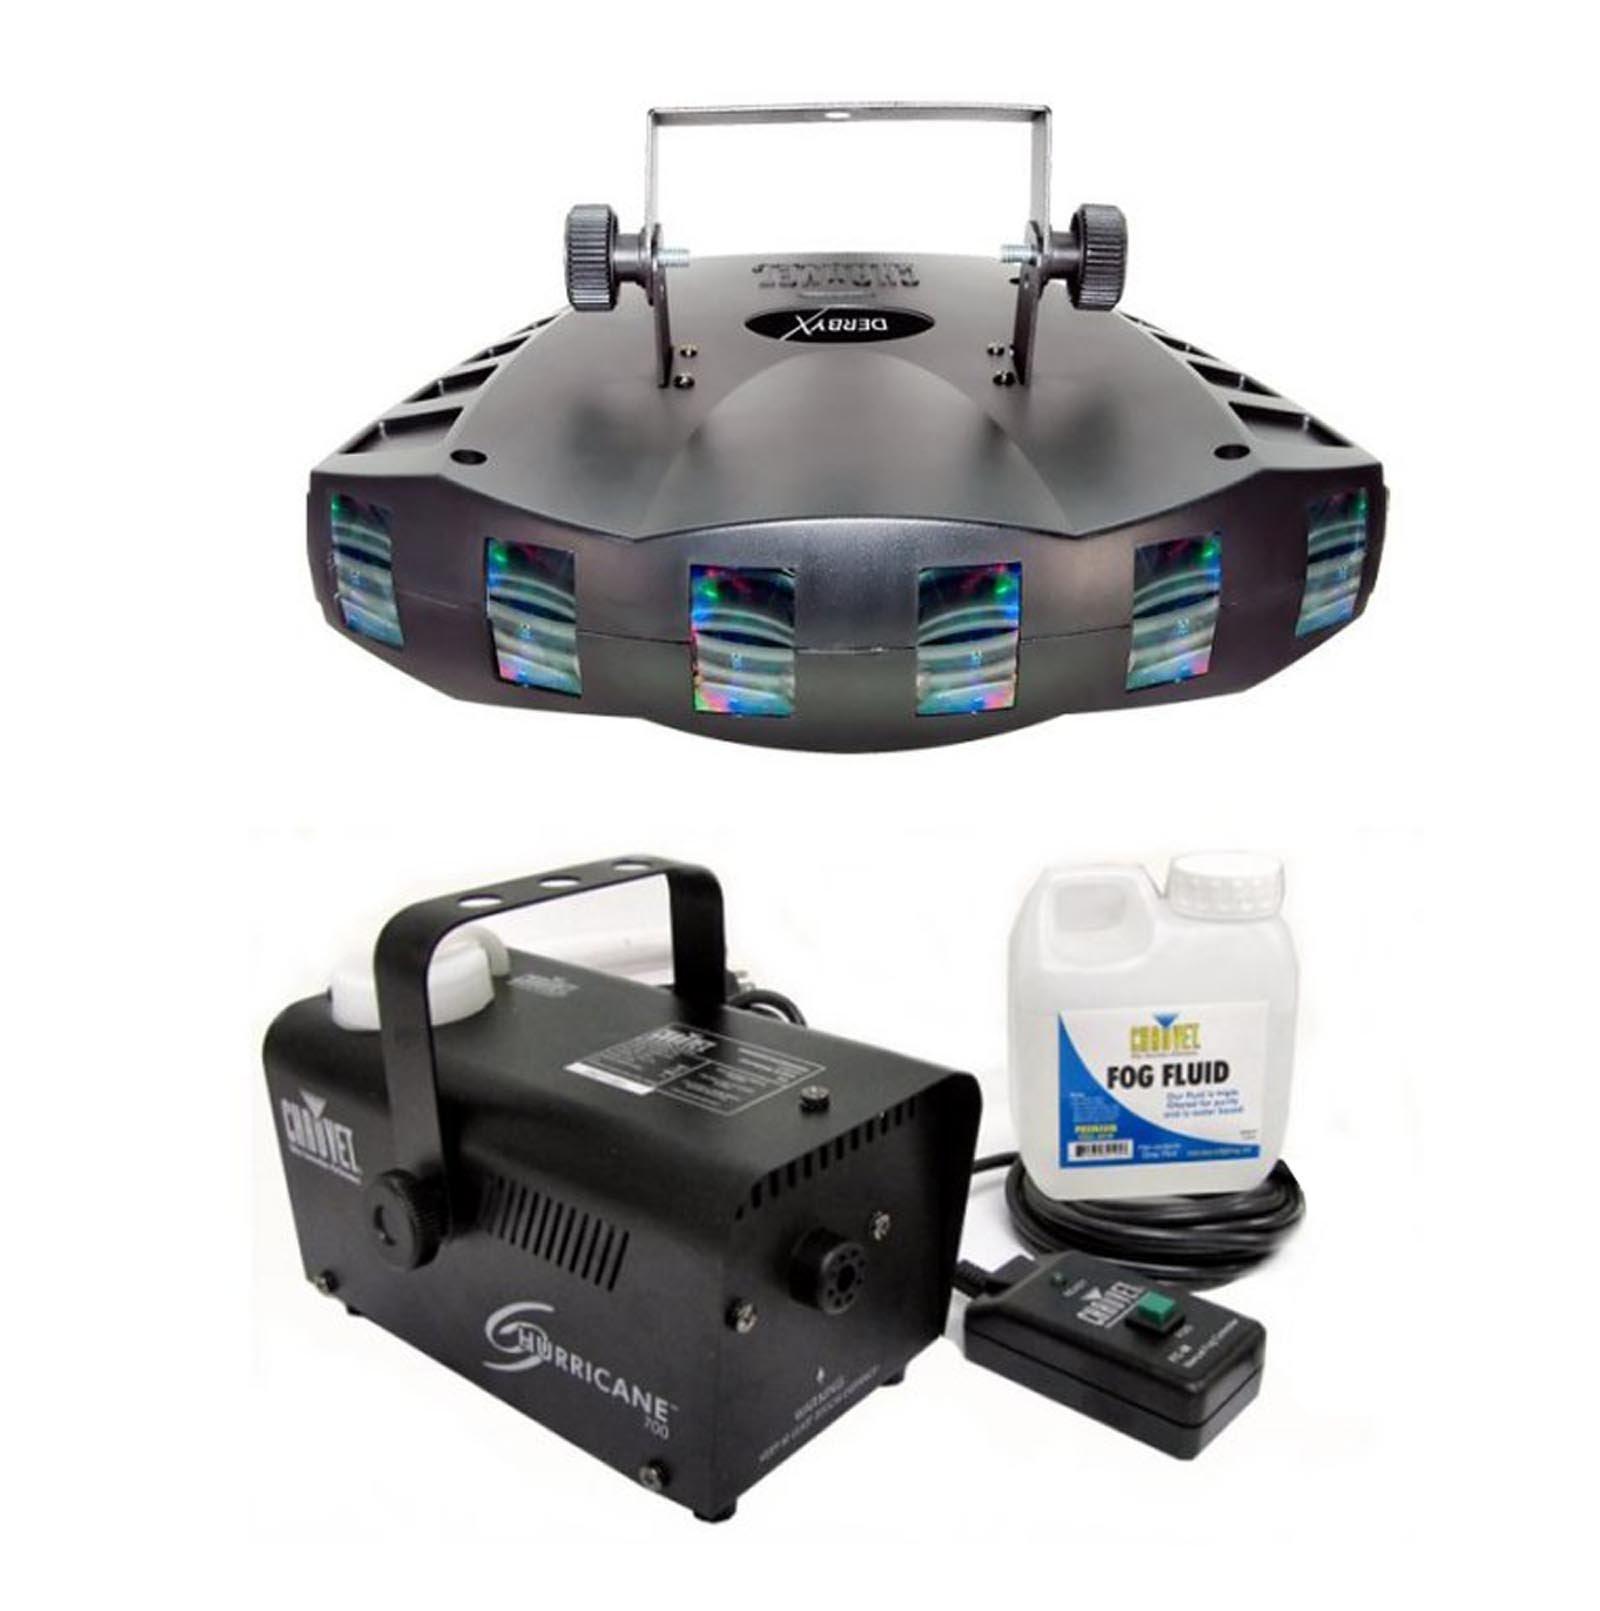 CHAUVET DERBY X RGB DMX Pro DJ Club Effect Strobe Light + H700 Fog/Smoke Machine